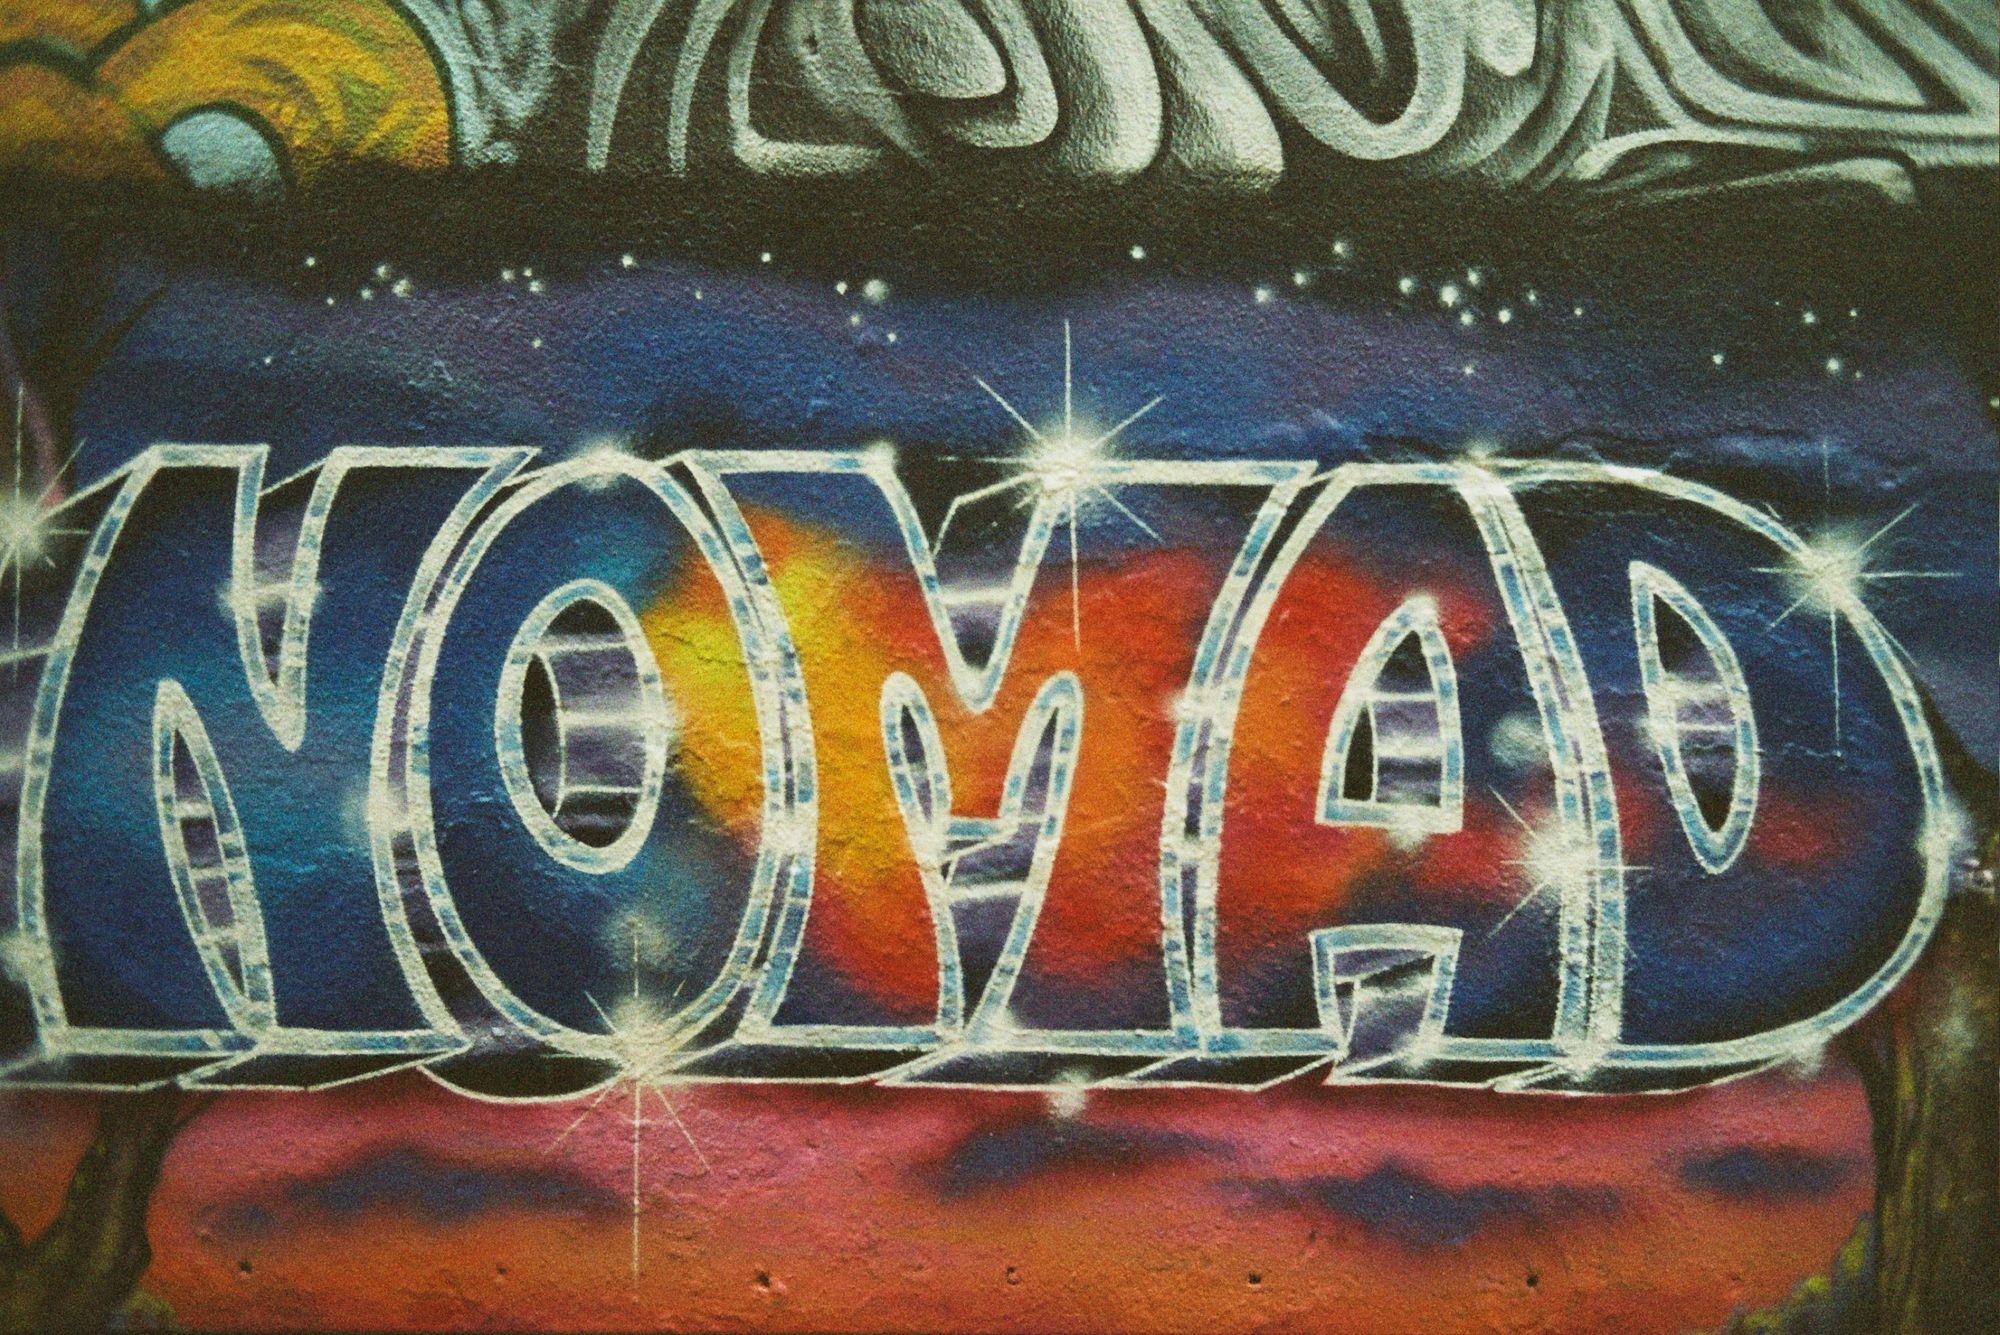 Nomad Street Art Sign